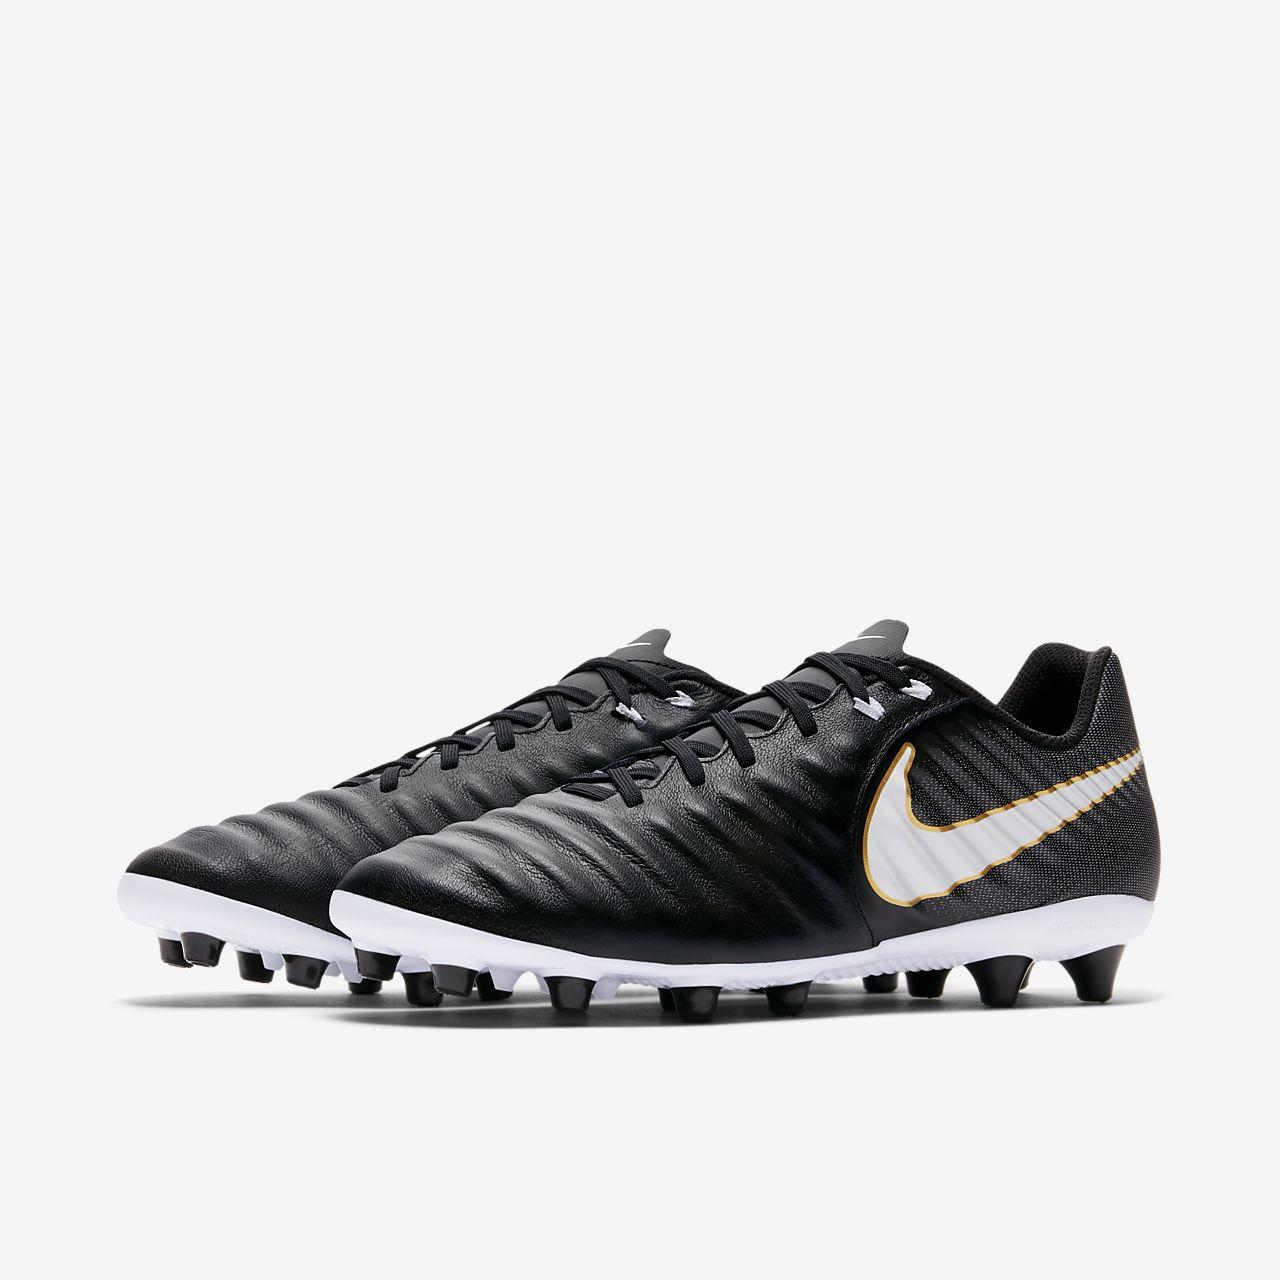 906b874bf491 Nike Tiempo Ligera IV AG-PRO Artificial-Grass Football Boot ...